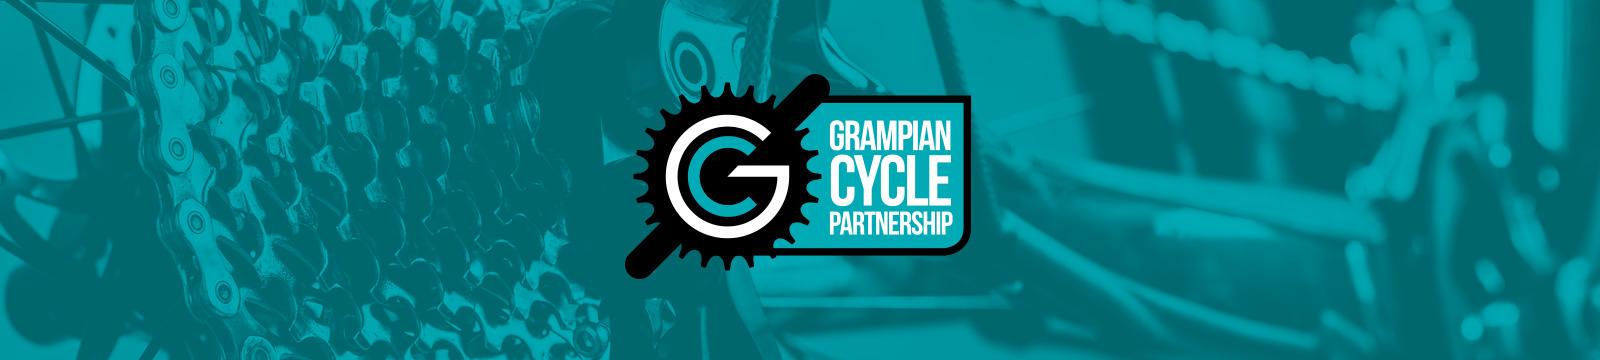 Grampian Cycle Partnership logo